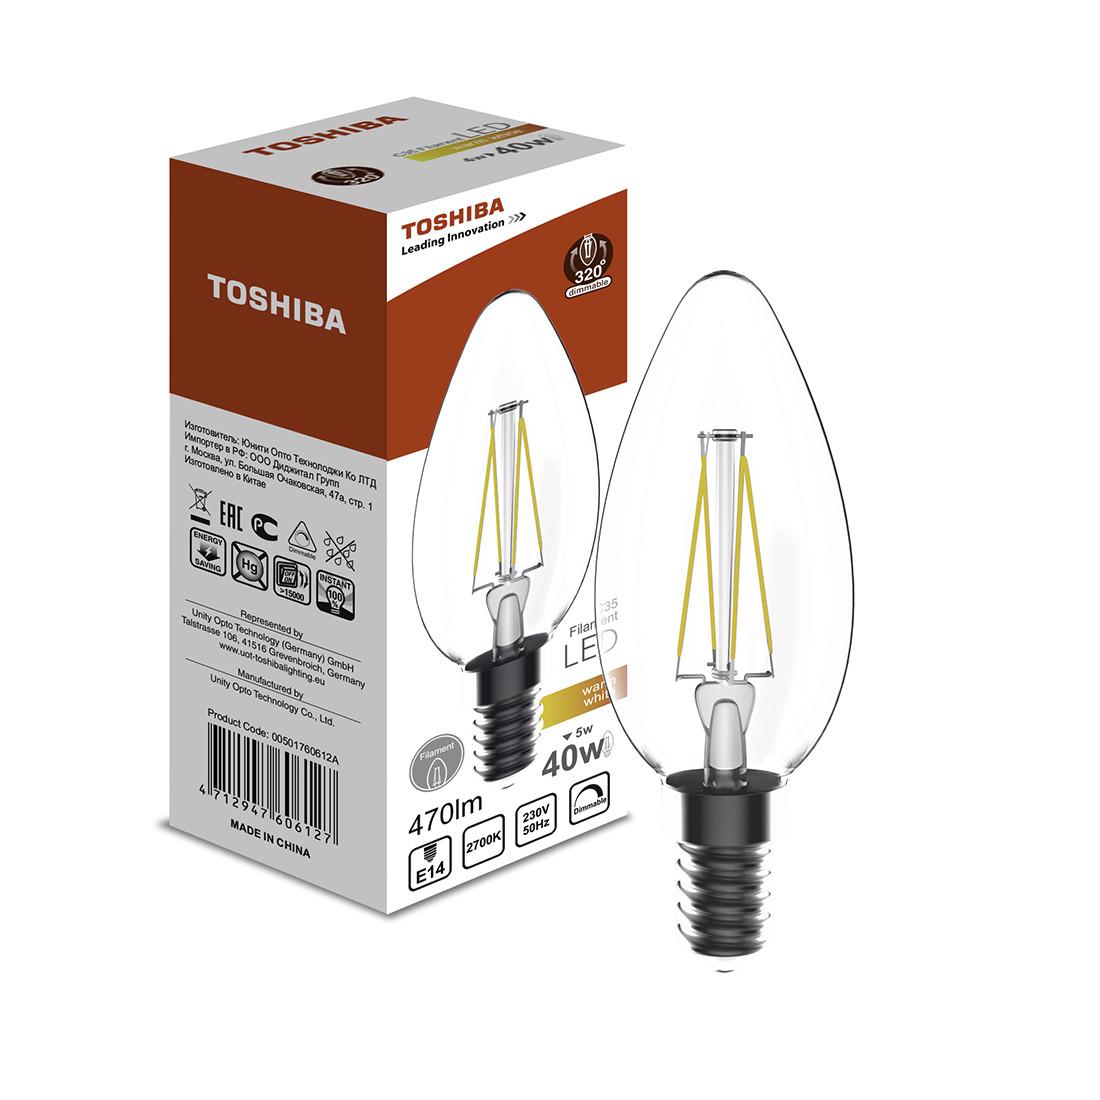 Филаментная лампа Toshiba C35 5W (40W) 2700K 470lm E14 Dim Тёплый